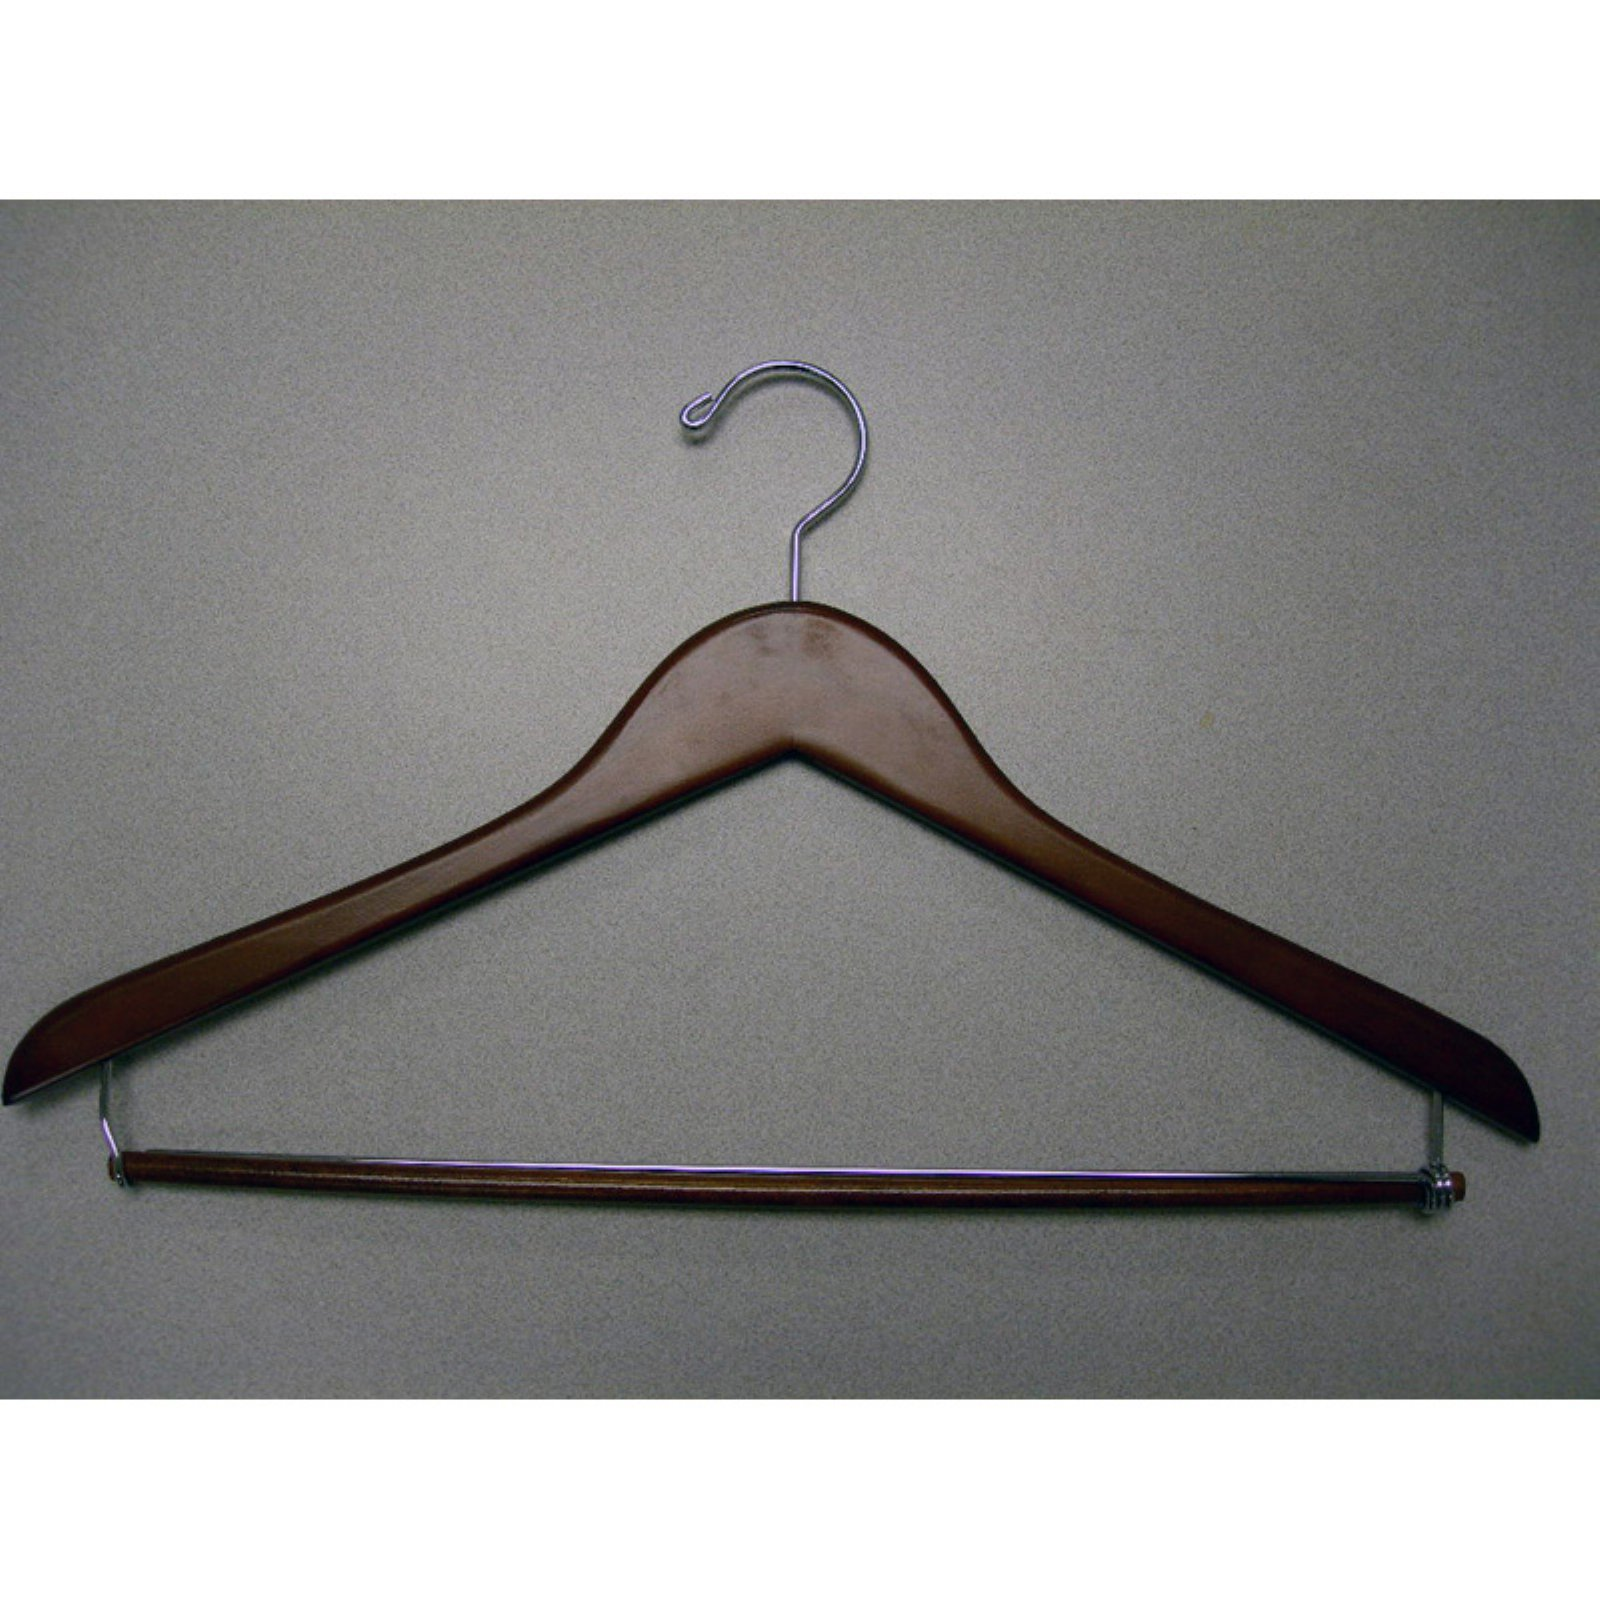 Proman Genesis Flat Suit Hanger with Lock Bar - 50 Pieces